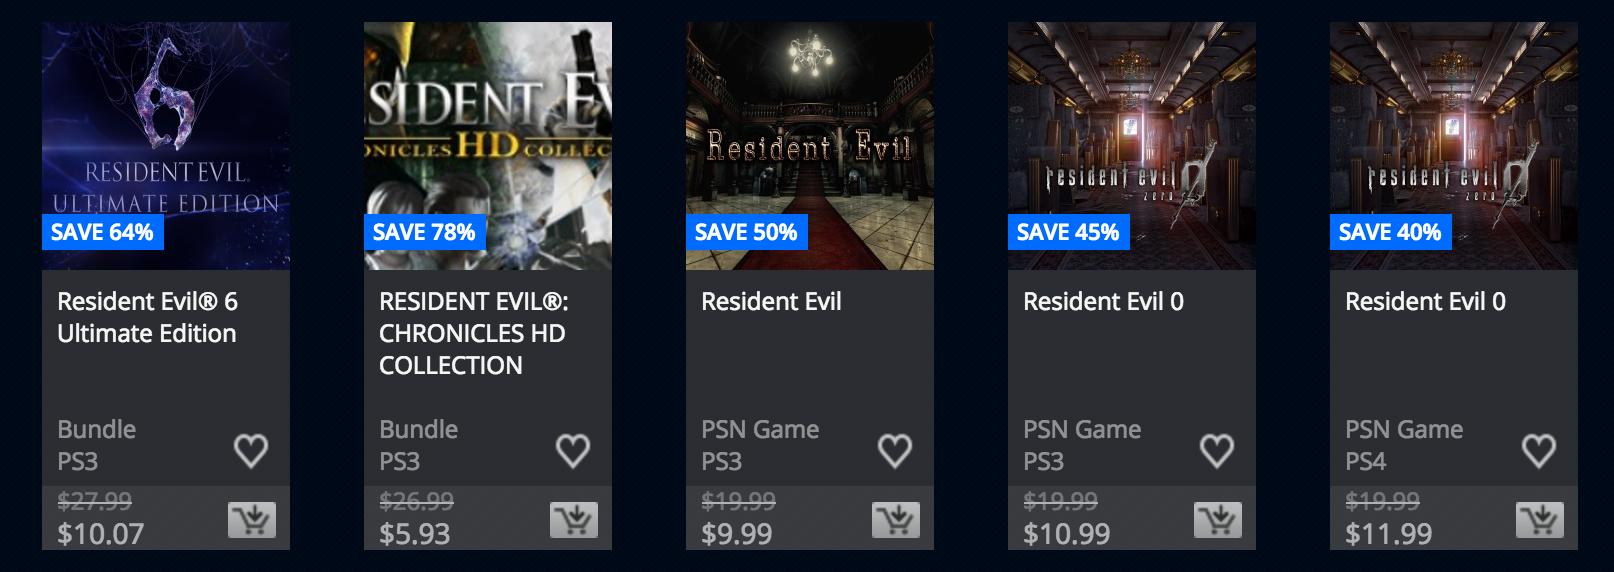 resident-evil-sale